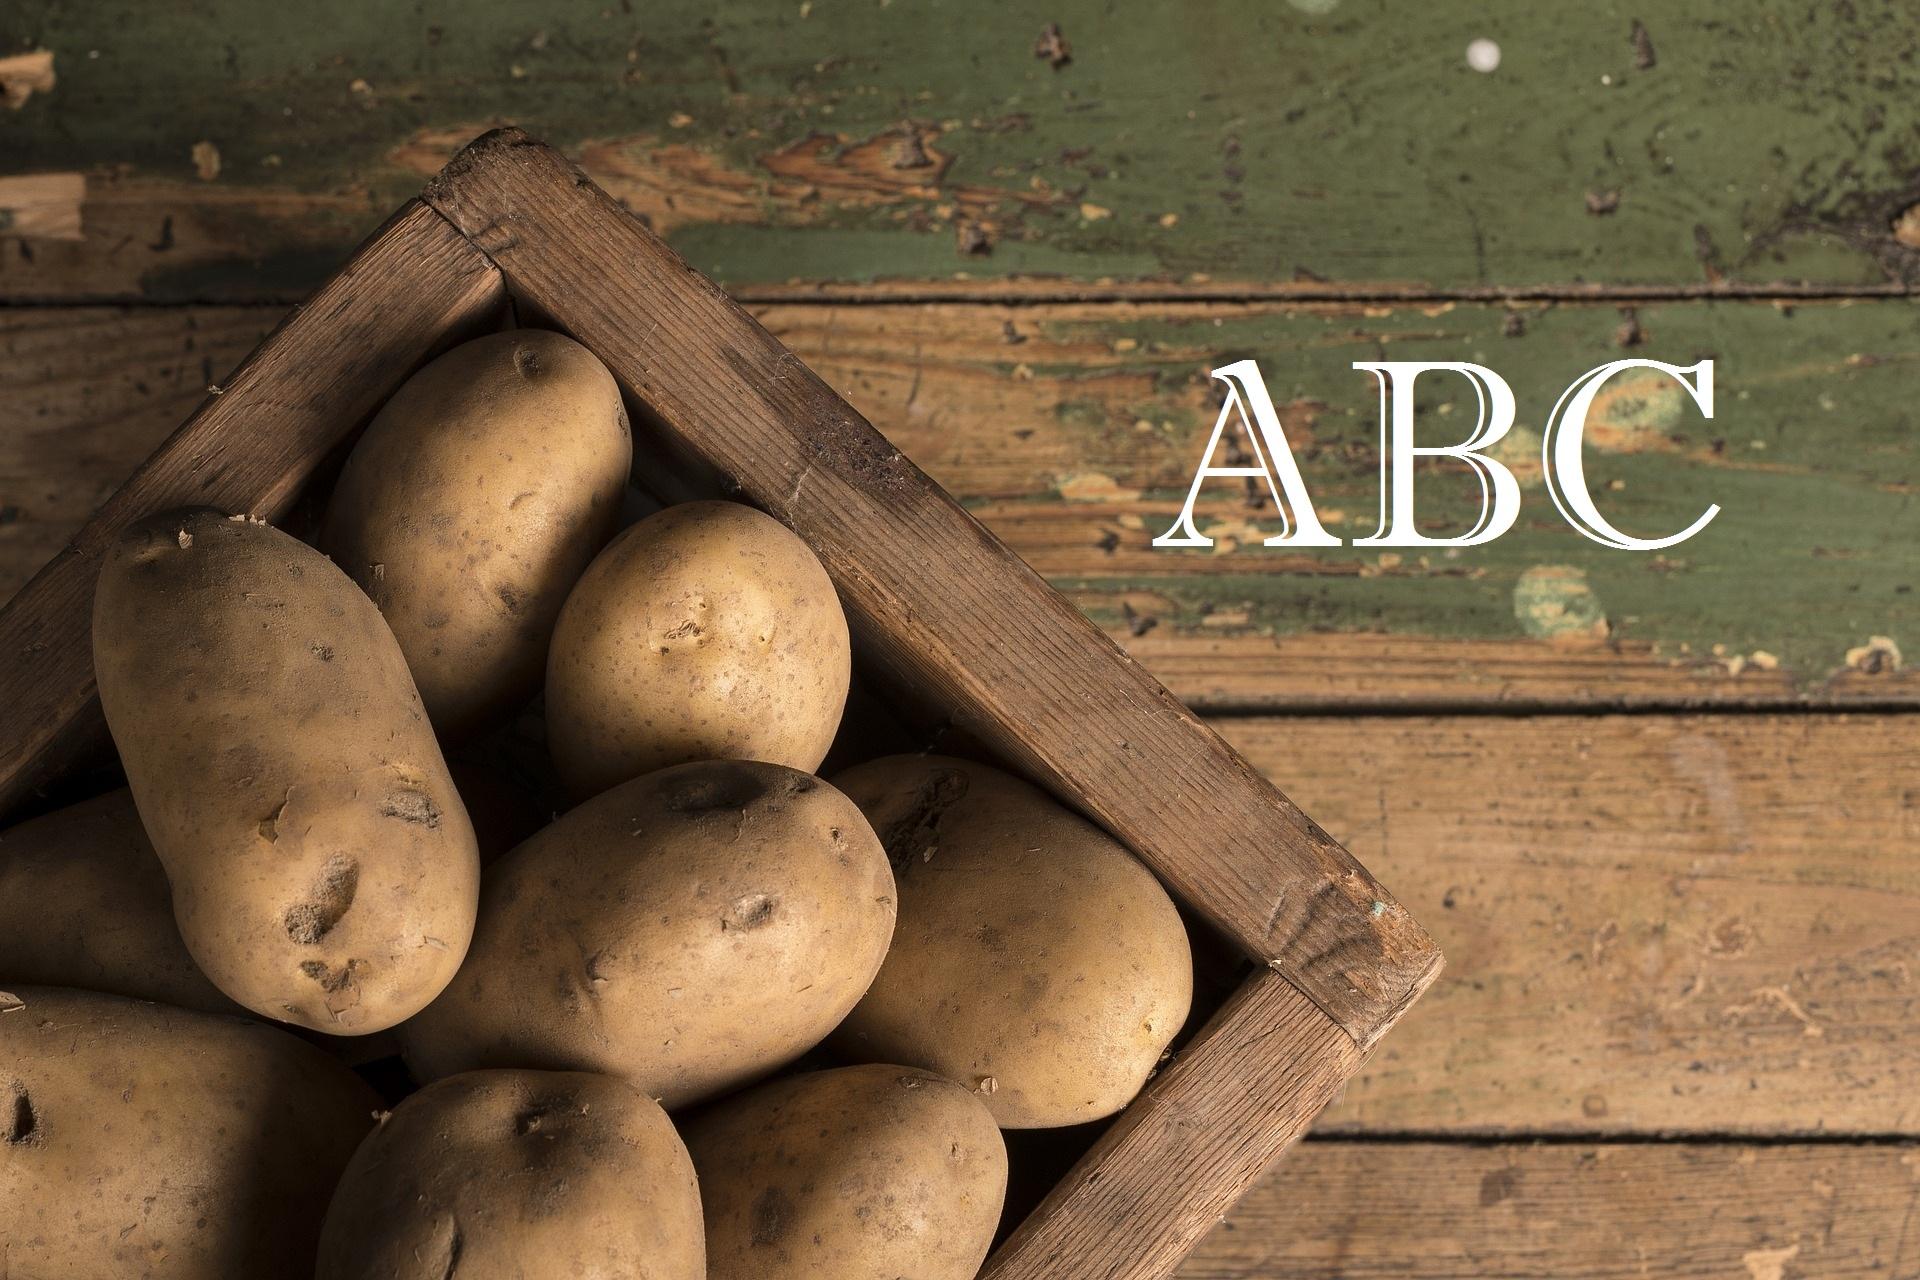 Burgonya ABC